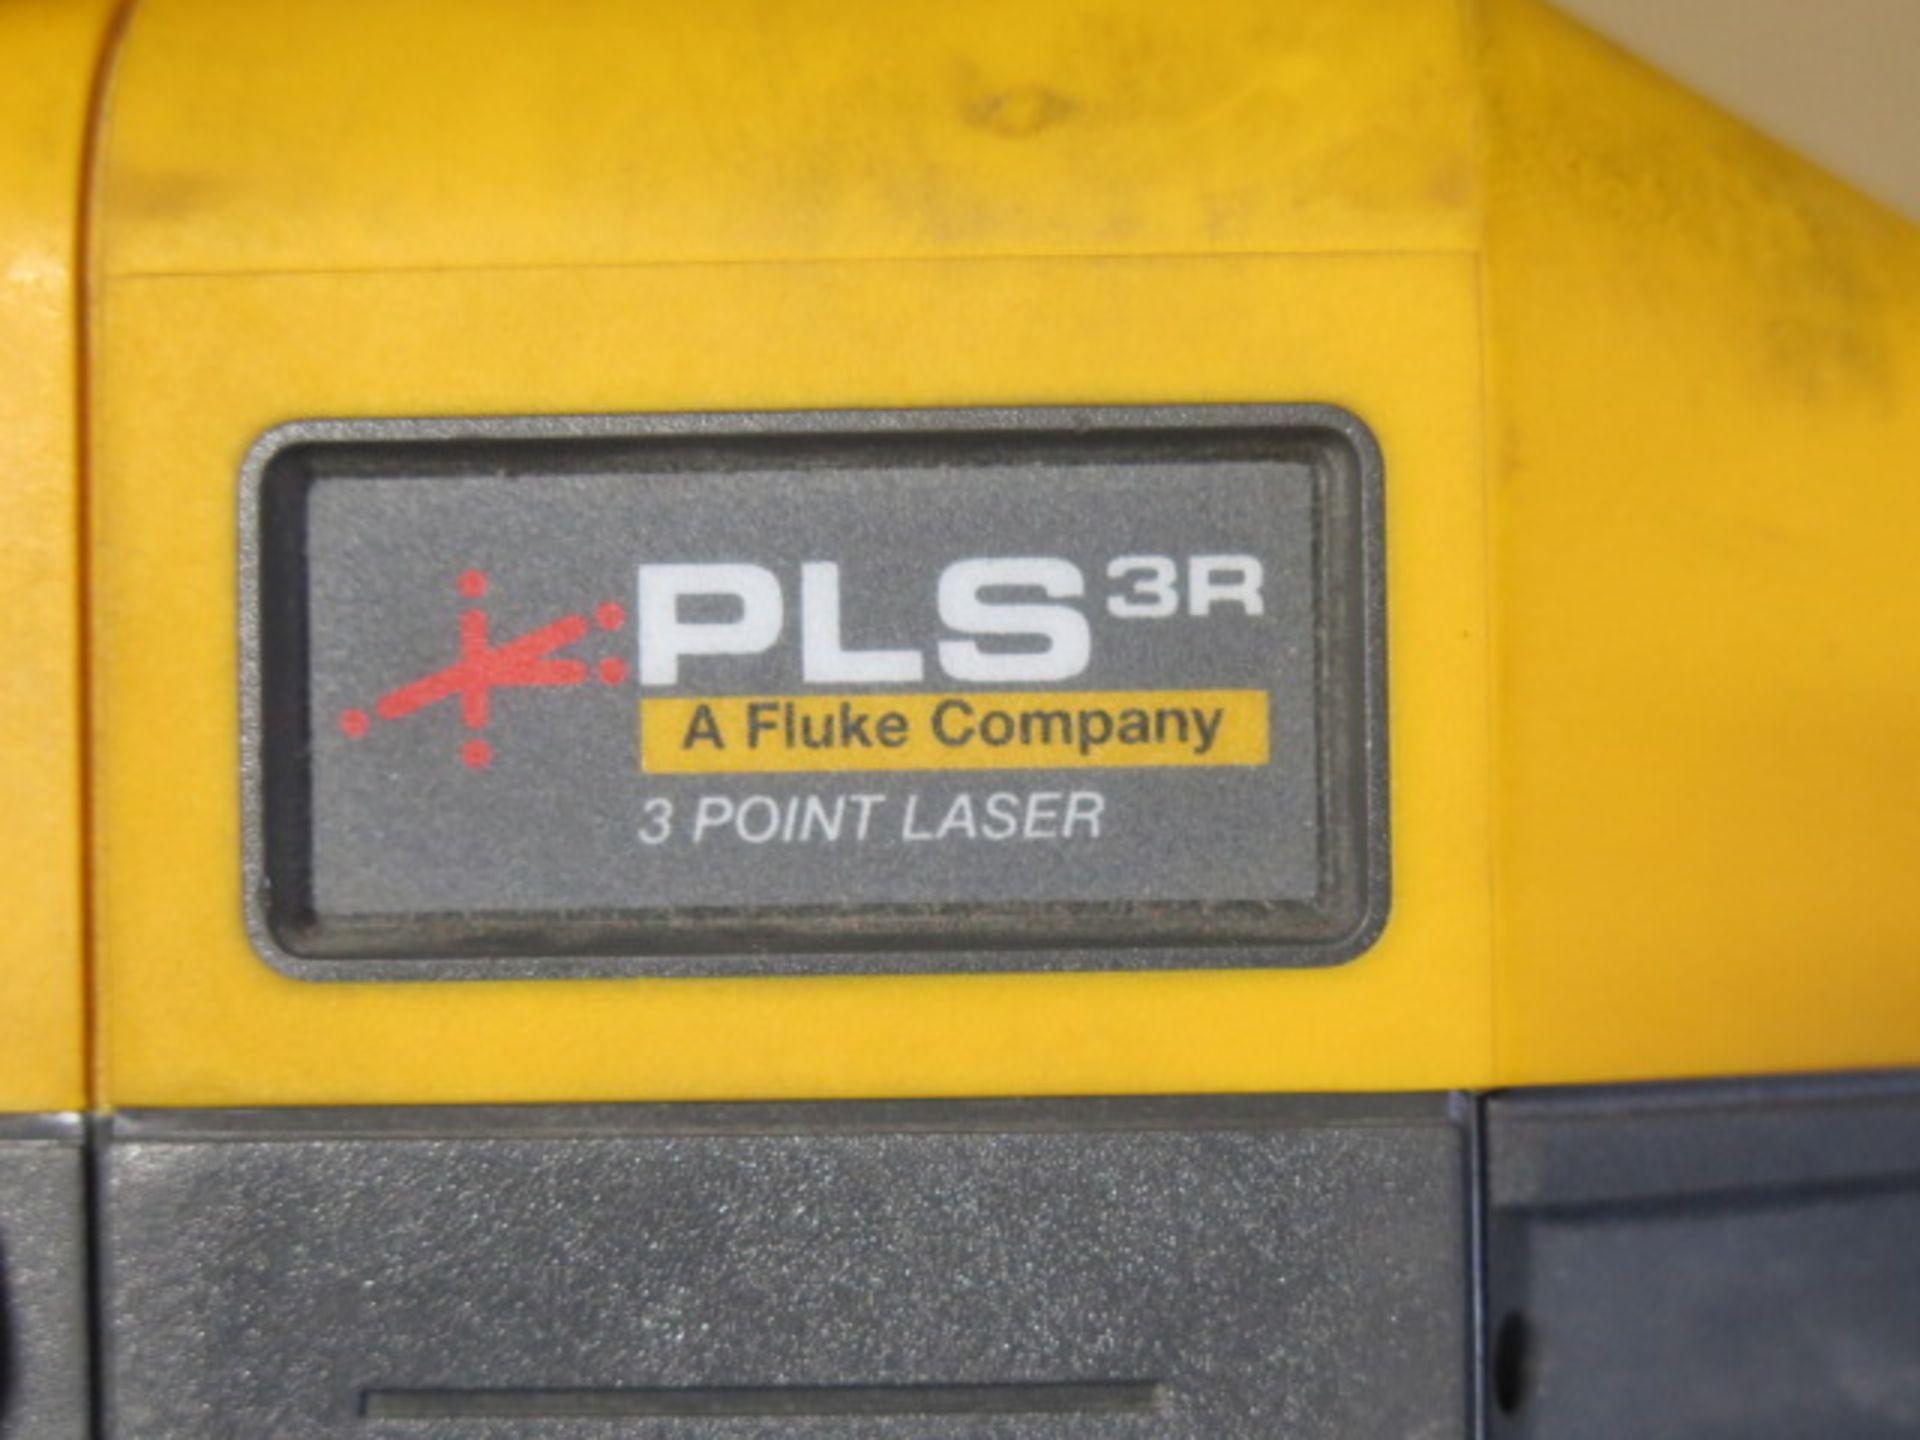 Fluke PLS 3R 3-Point Laser Levels (3) (SOLD AS-IS - NO WARRANTY) - Image 5 of 5